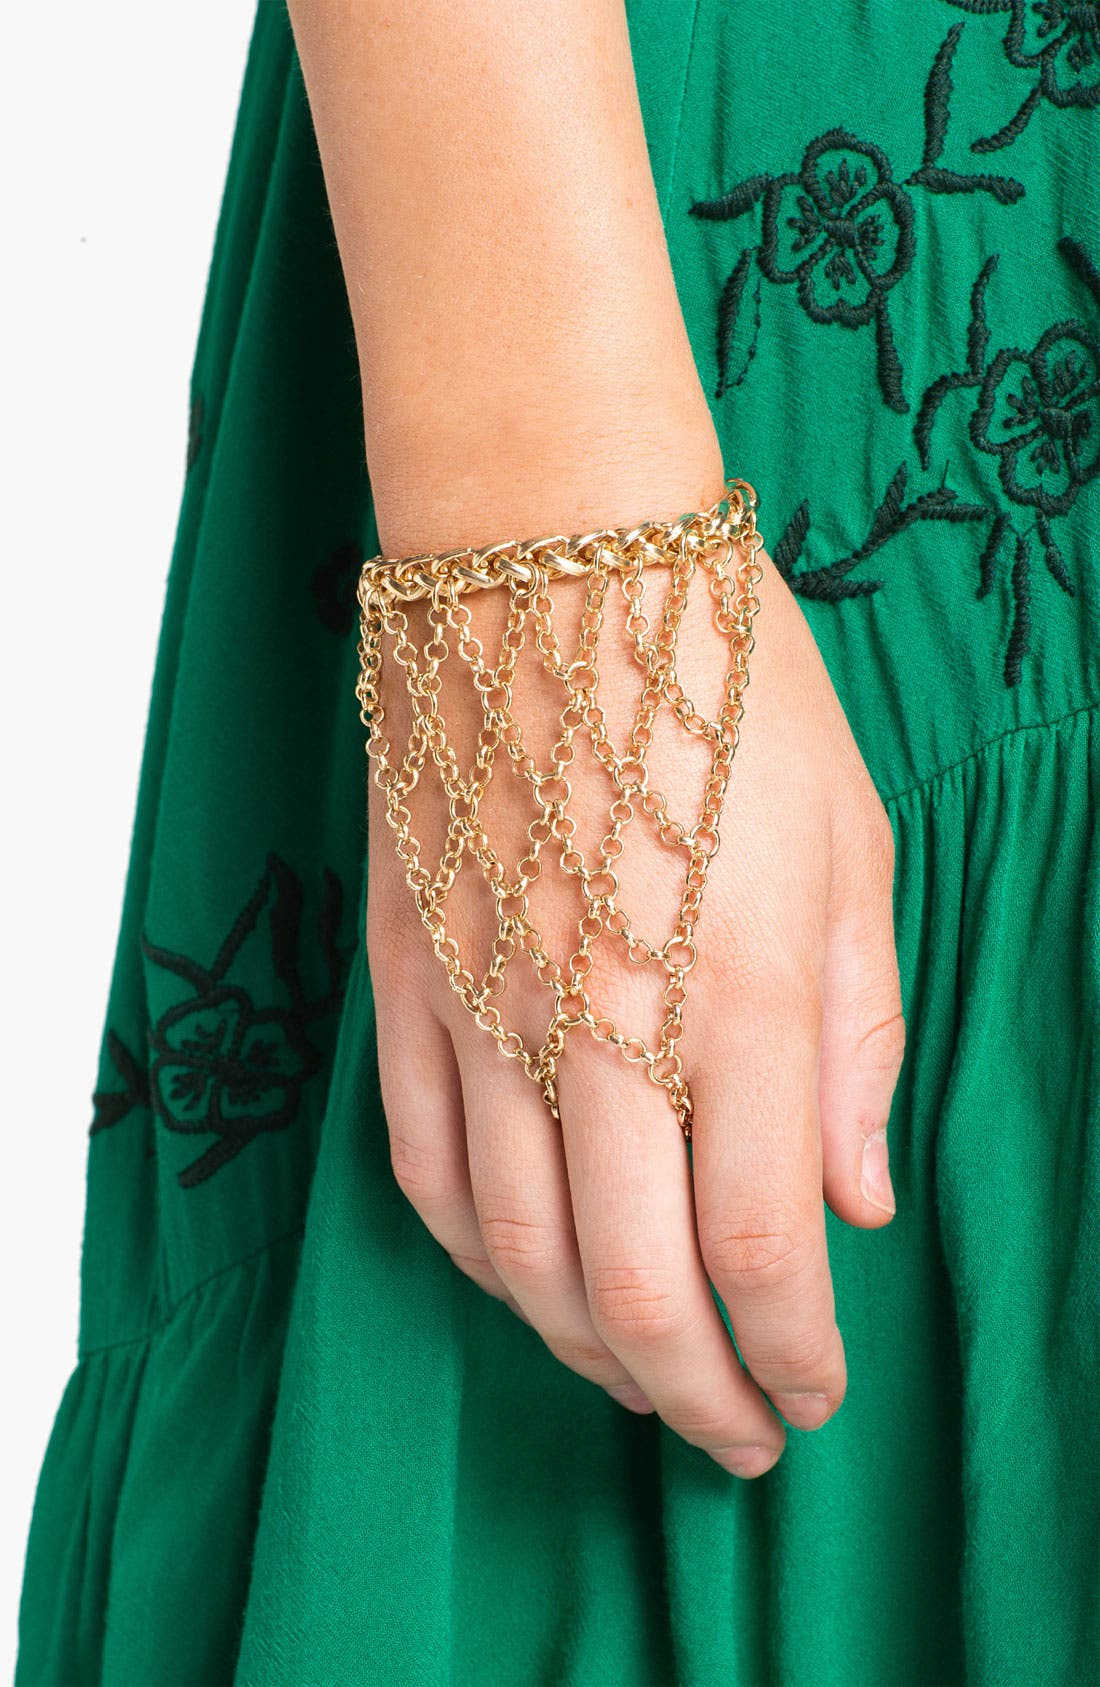 Main Image - Cara Hand Chain